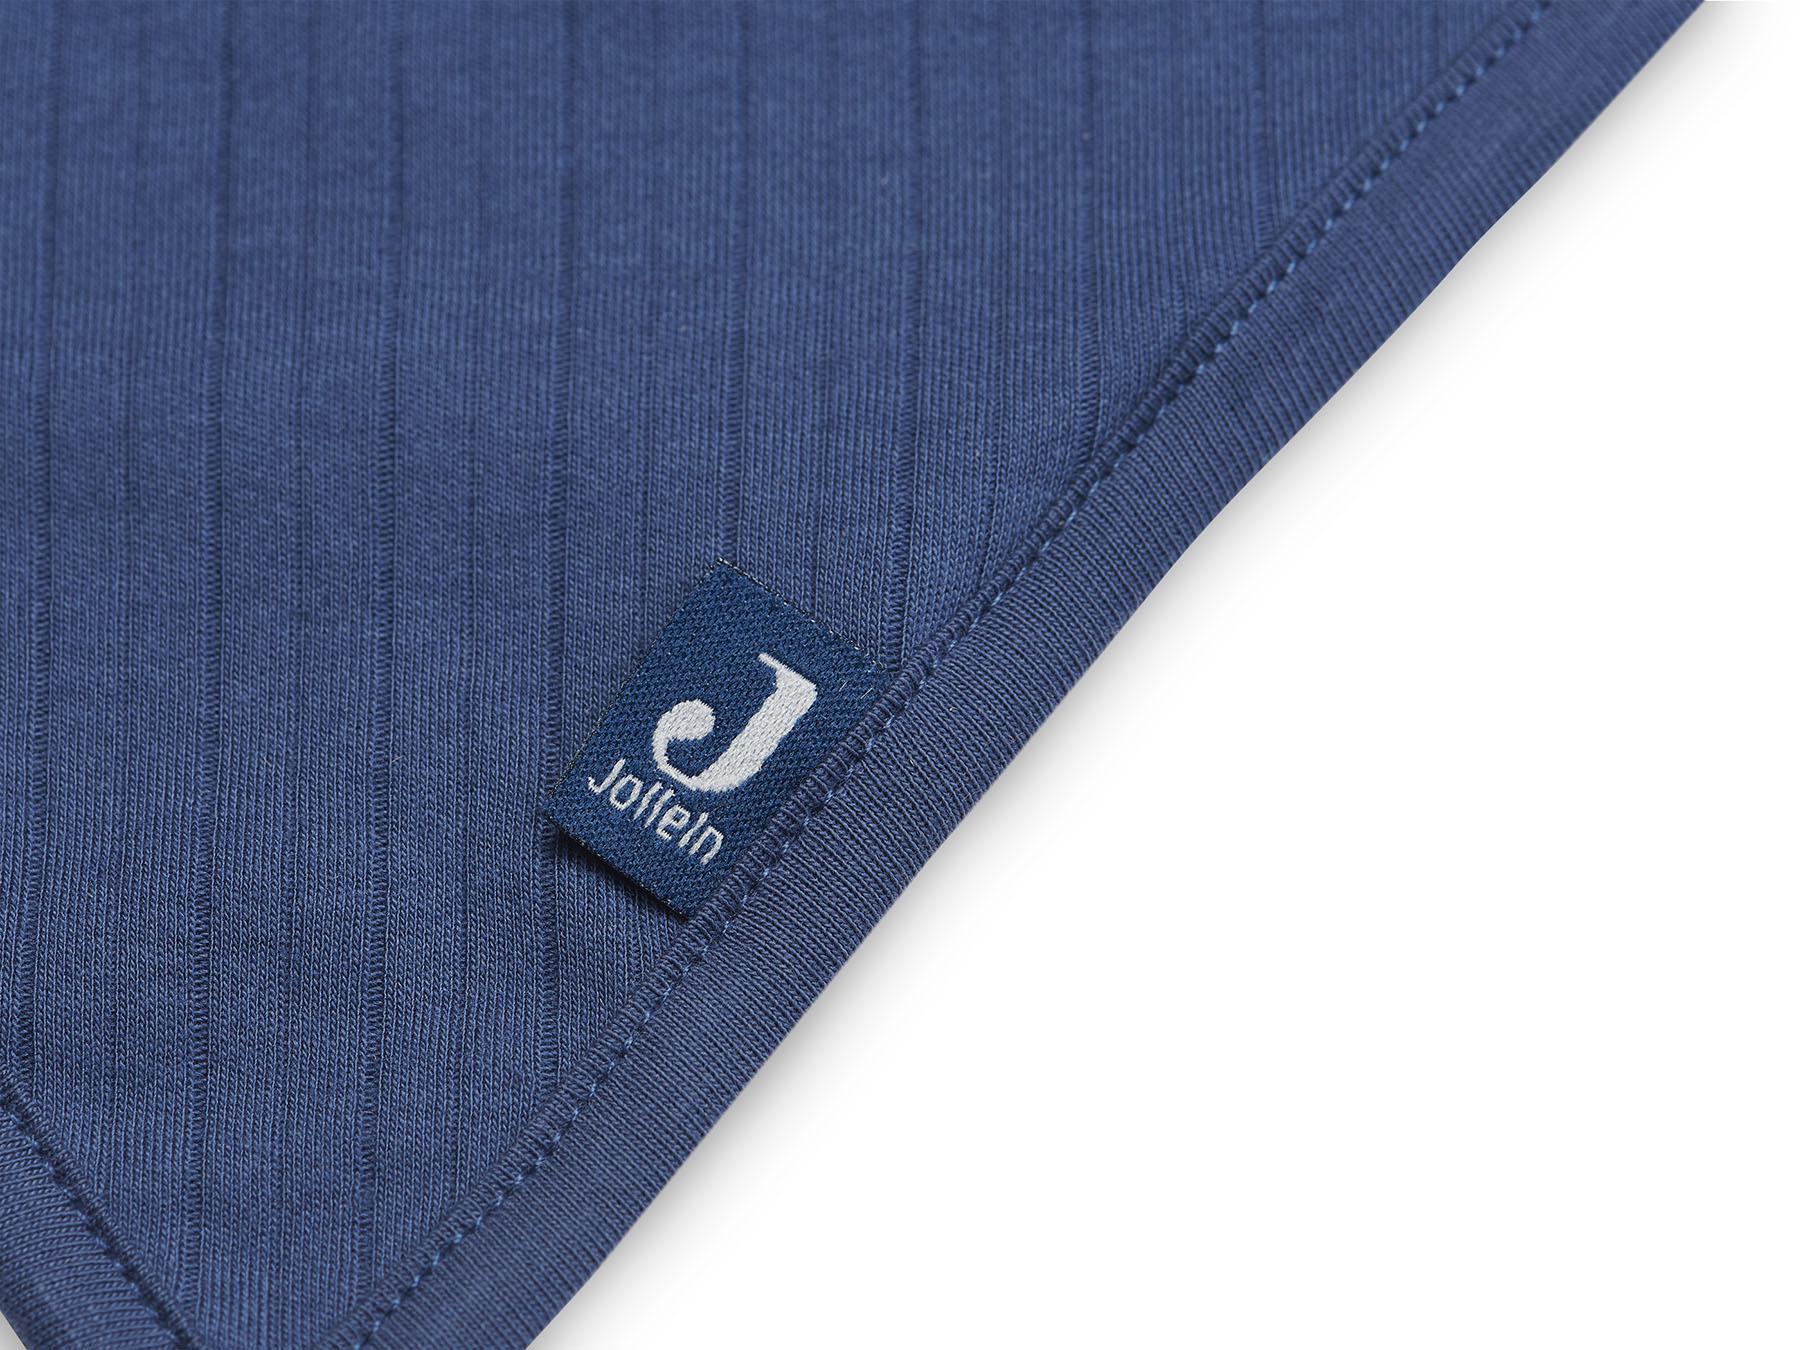 Afbeelding Jollein Slab Bandana Basic Stripe I jeans blue (2pack)